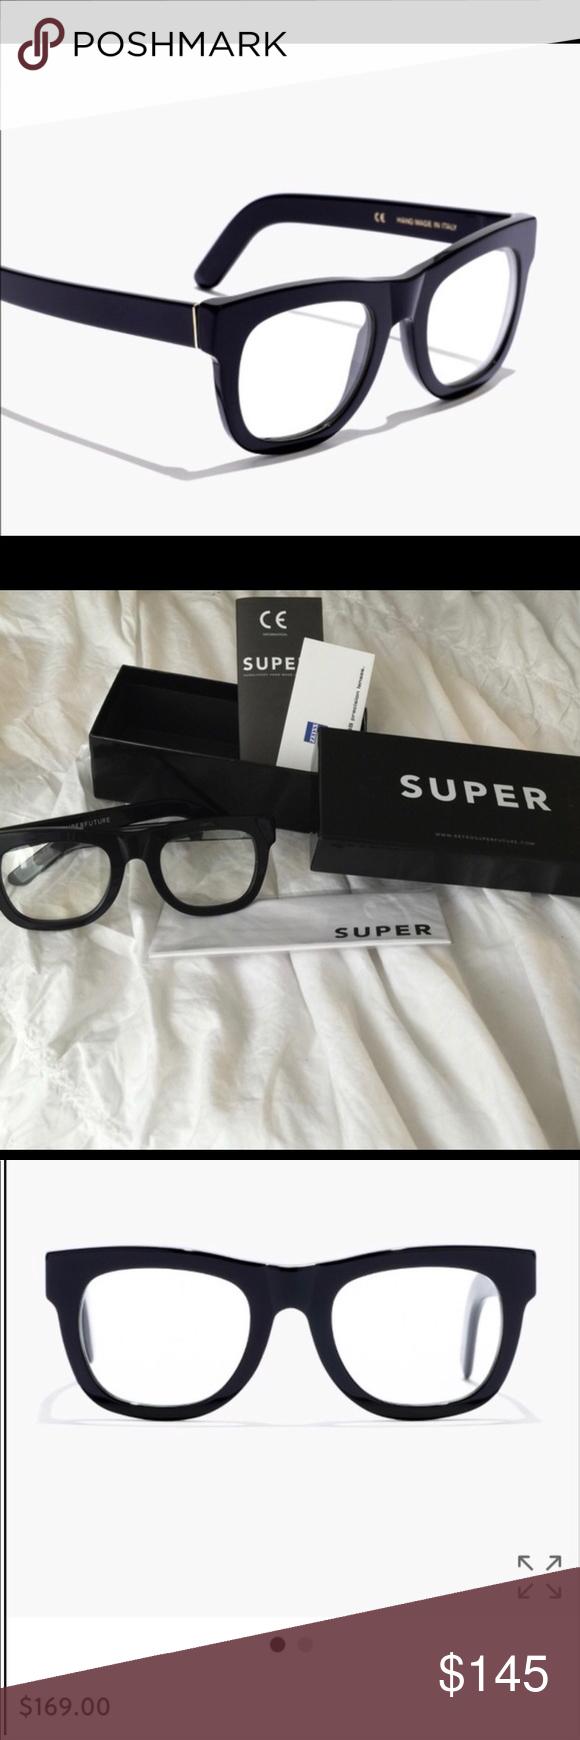 6569fadb73 BRAND NEW   PRESH!! JCREW Super™ Ciccio eyeglasses NWT